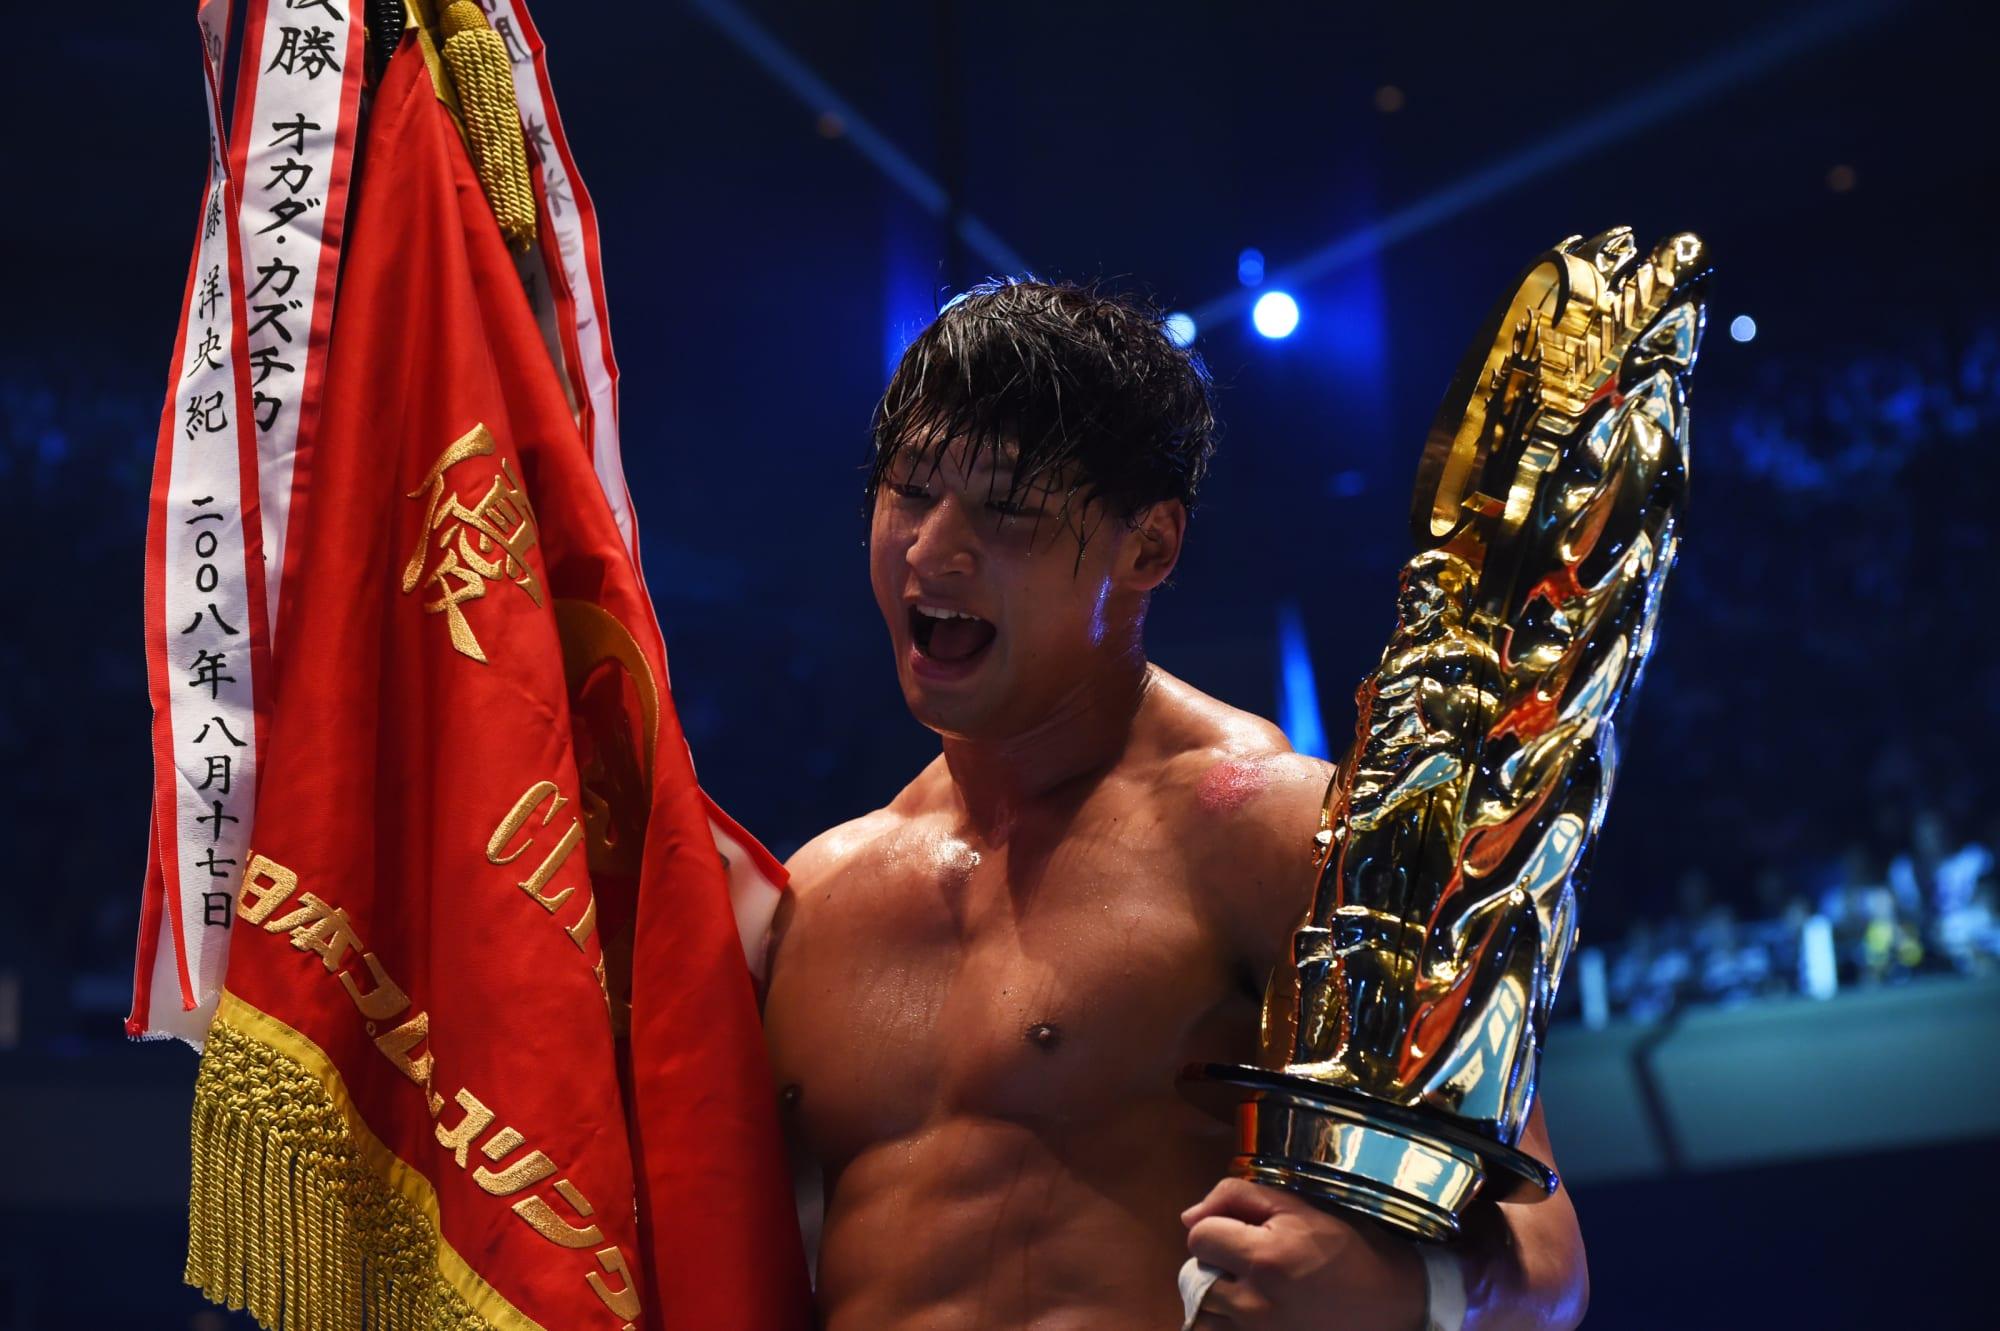 Kota Ibushi says almost everyone hated NJPW title unificaiton